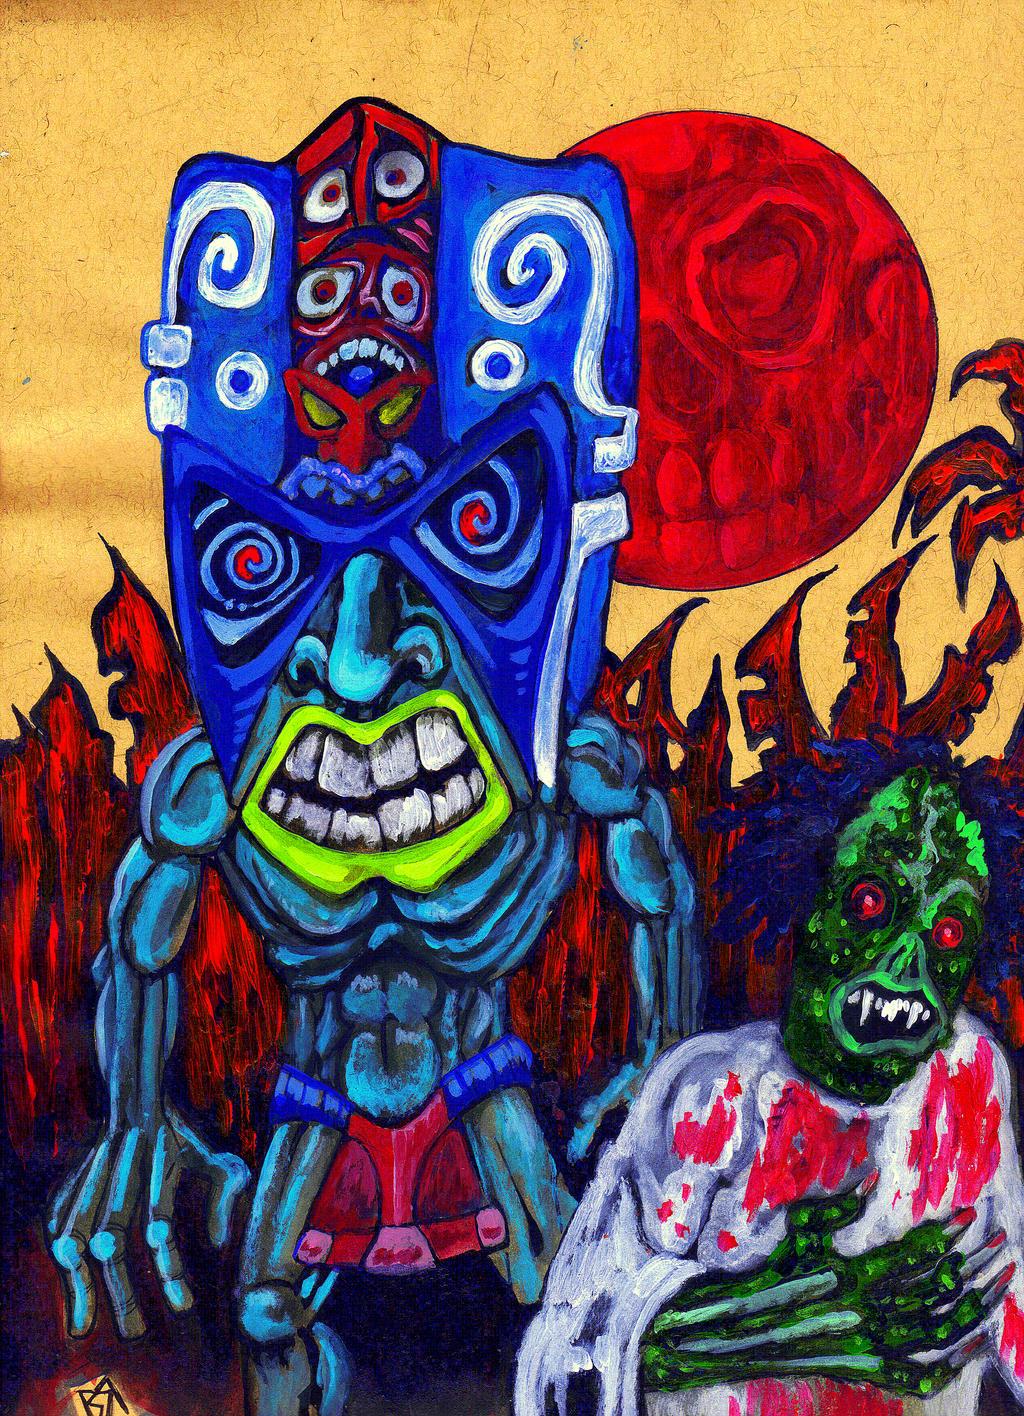 The Horrors of Blood Island by Ustranga